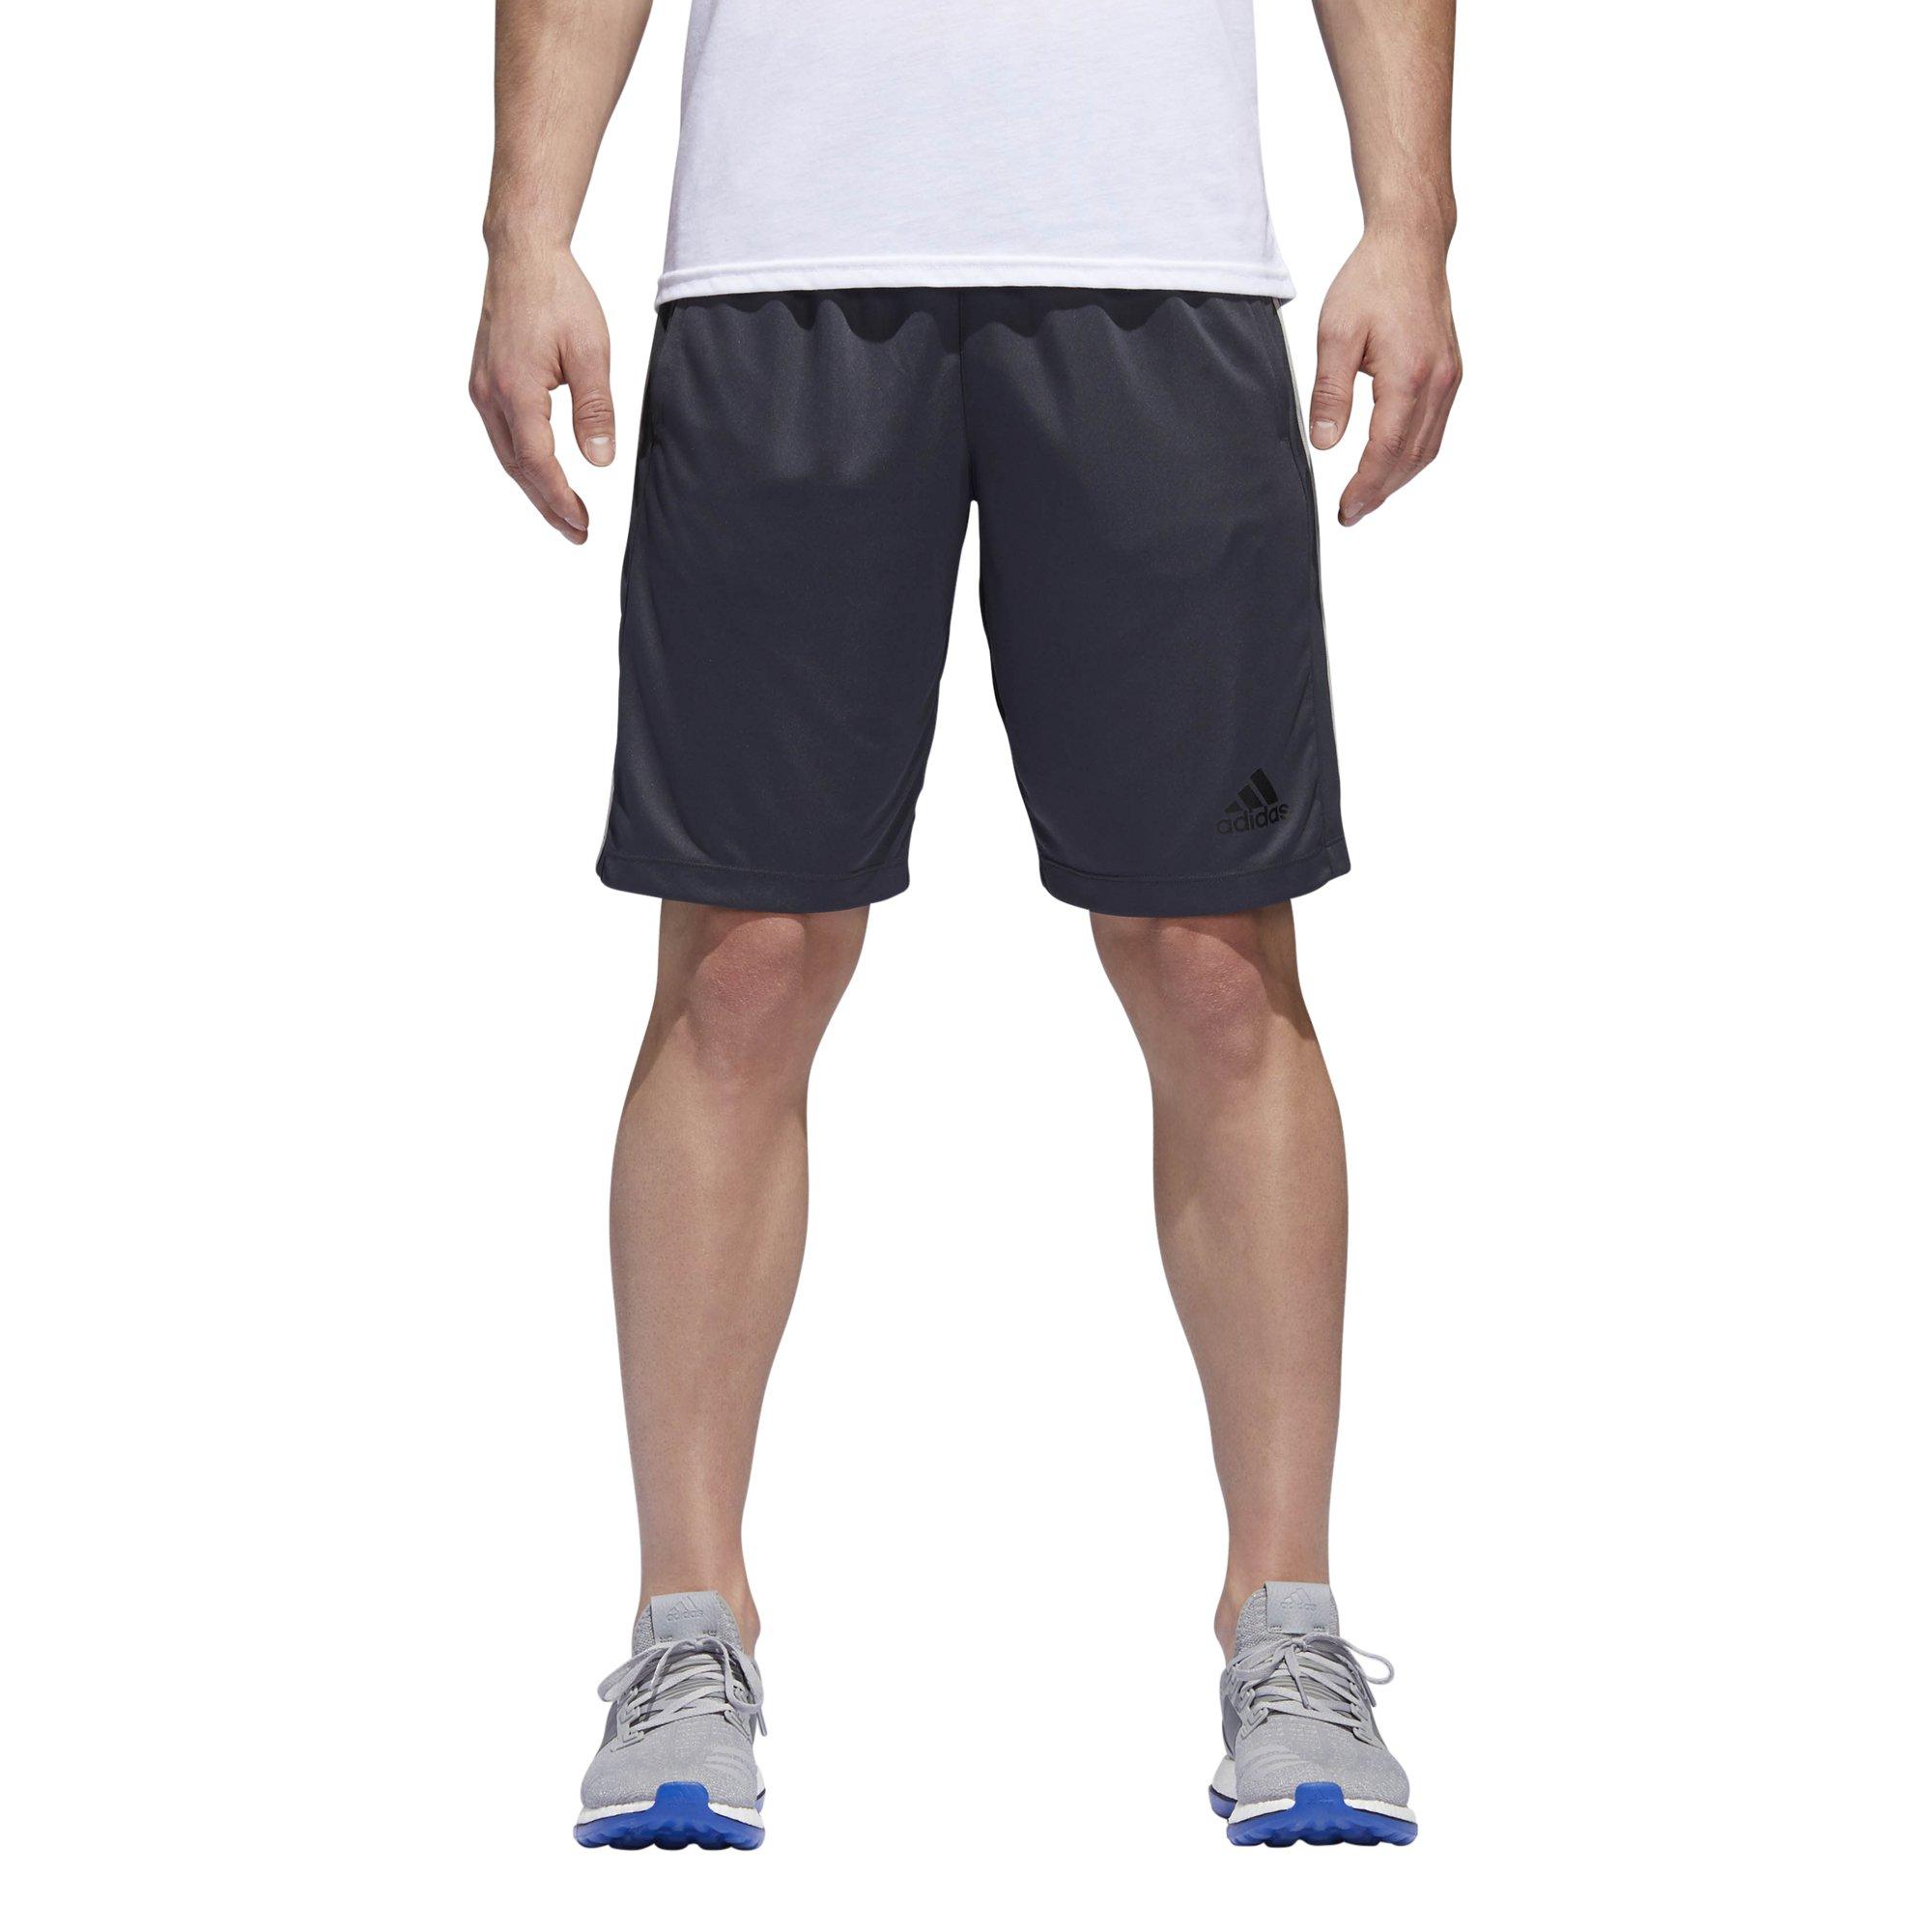 adidas Men's Designed-2-Move 3-Stripe Shorts, Dark